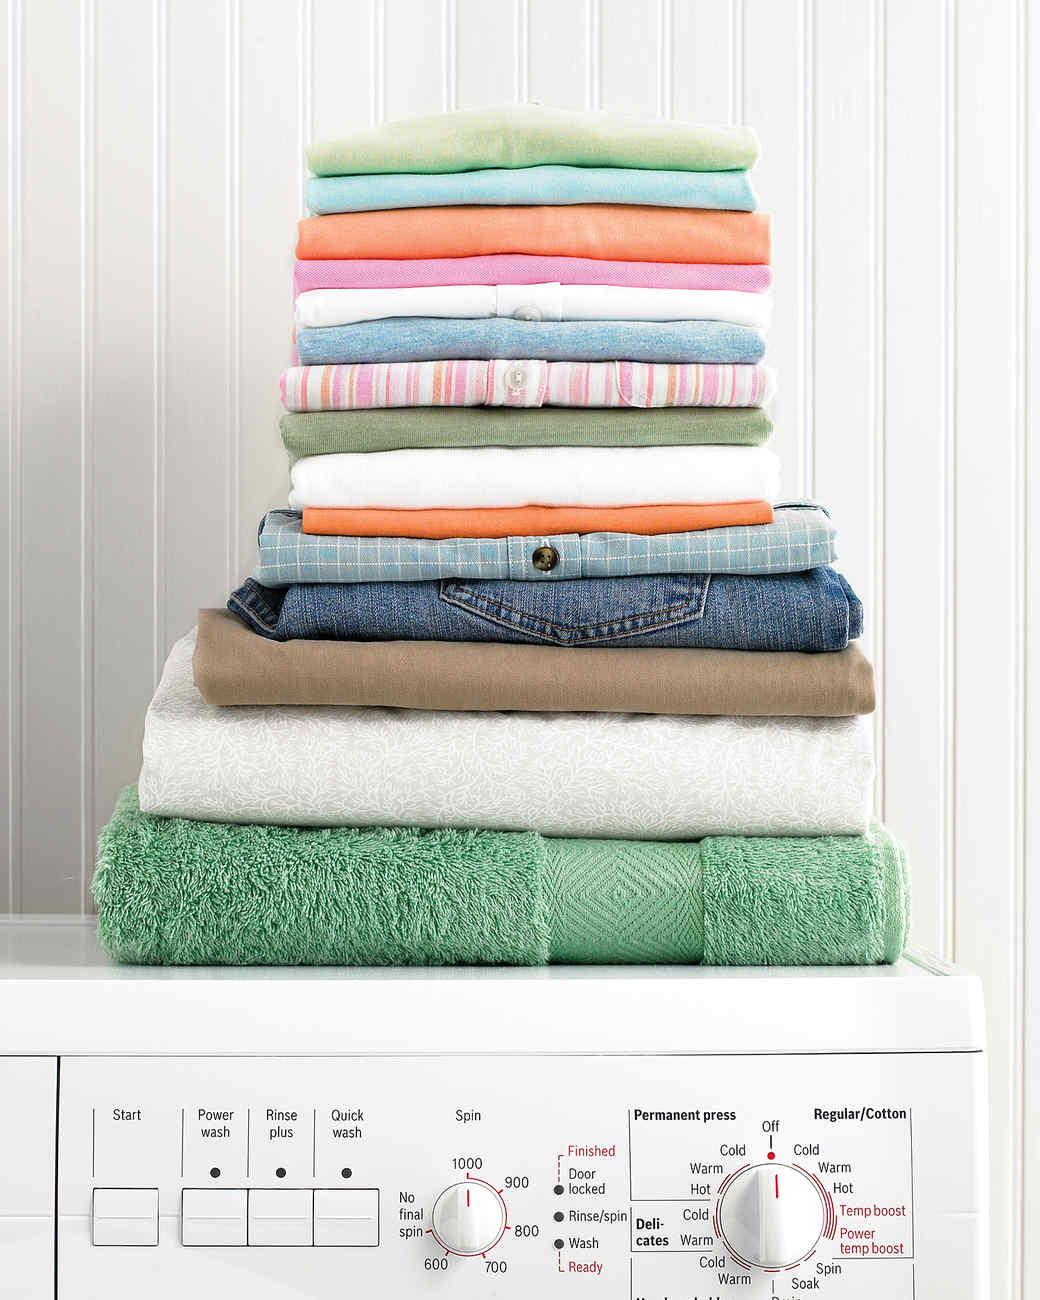 mld103785_0109_laundry.jpg